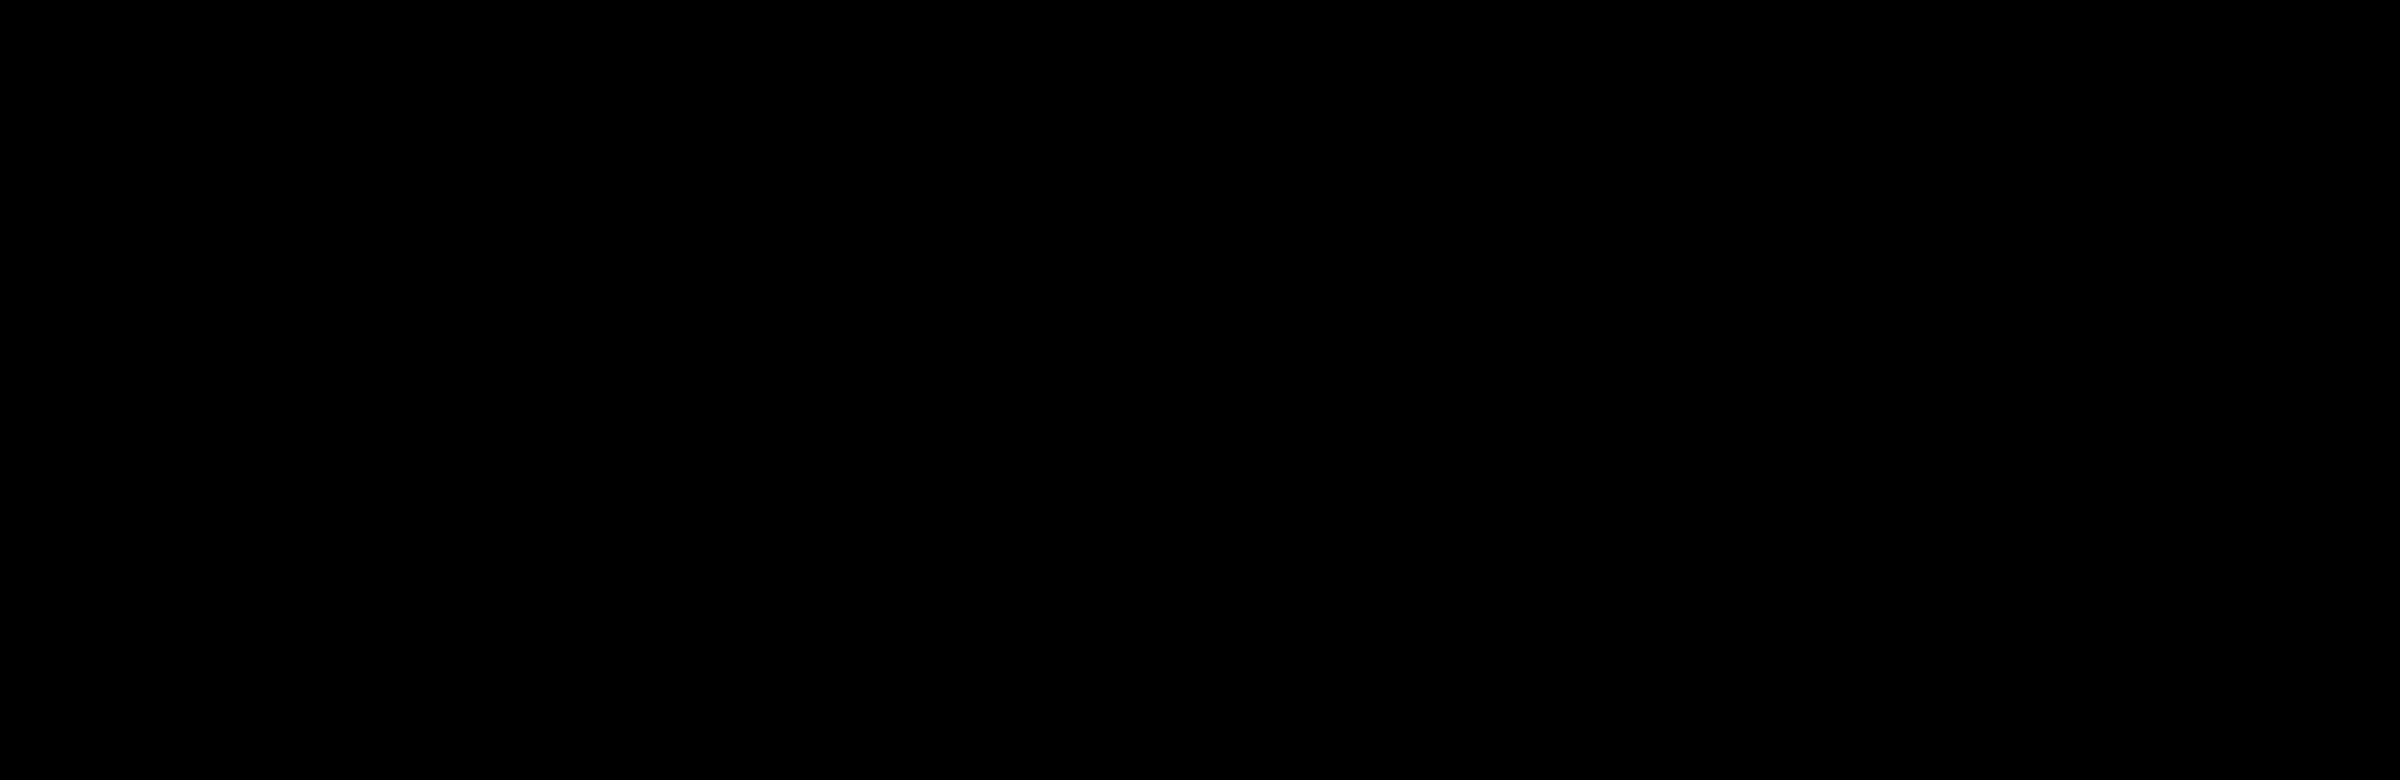 Clipart electronic logic symbol nand electronic logic symbol nand biocorpaavc